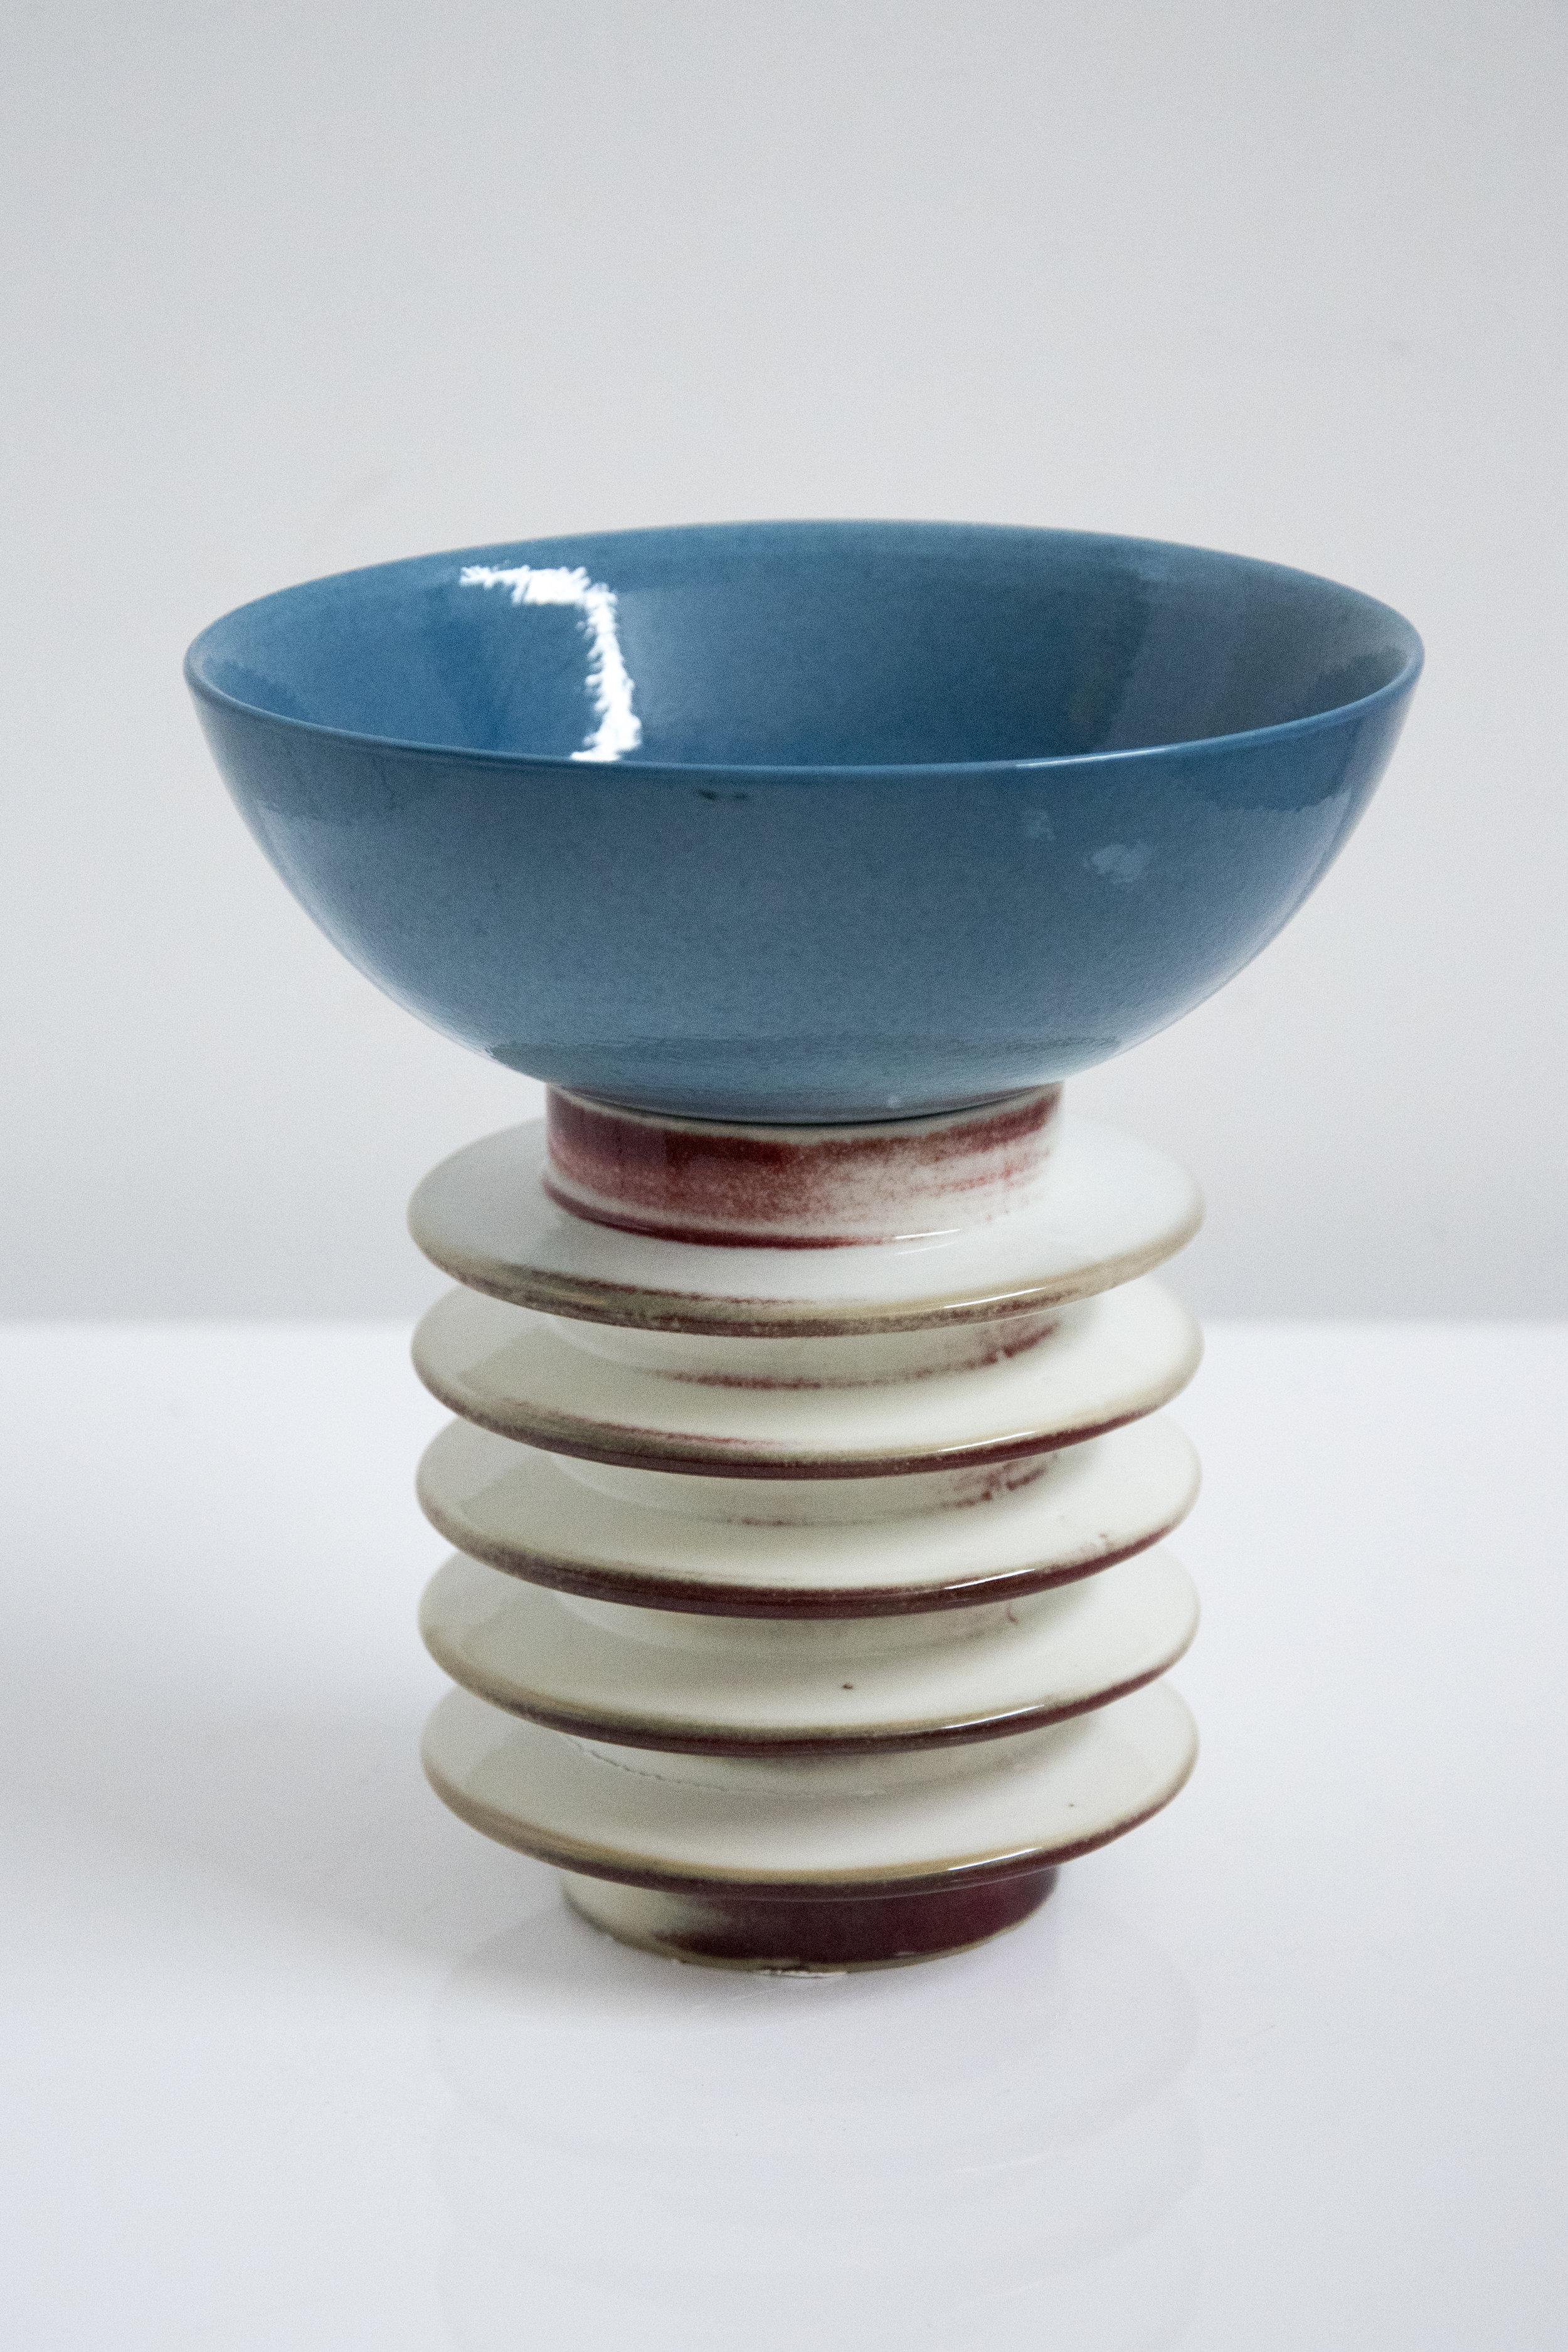 JDZ porcelain works - David Derksen30.jpg